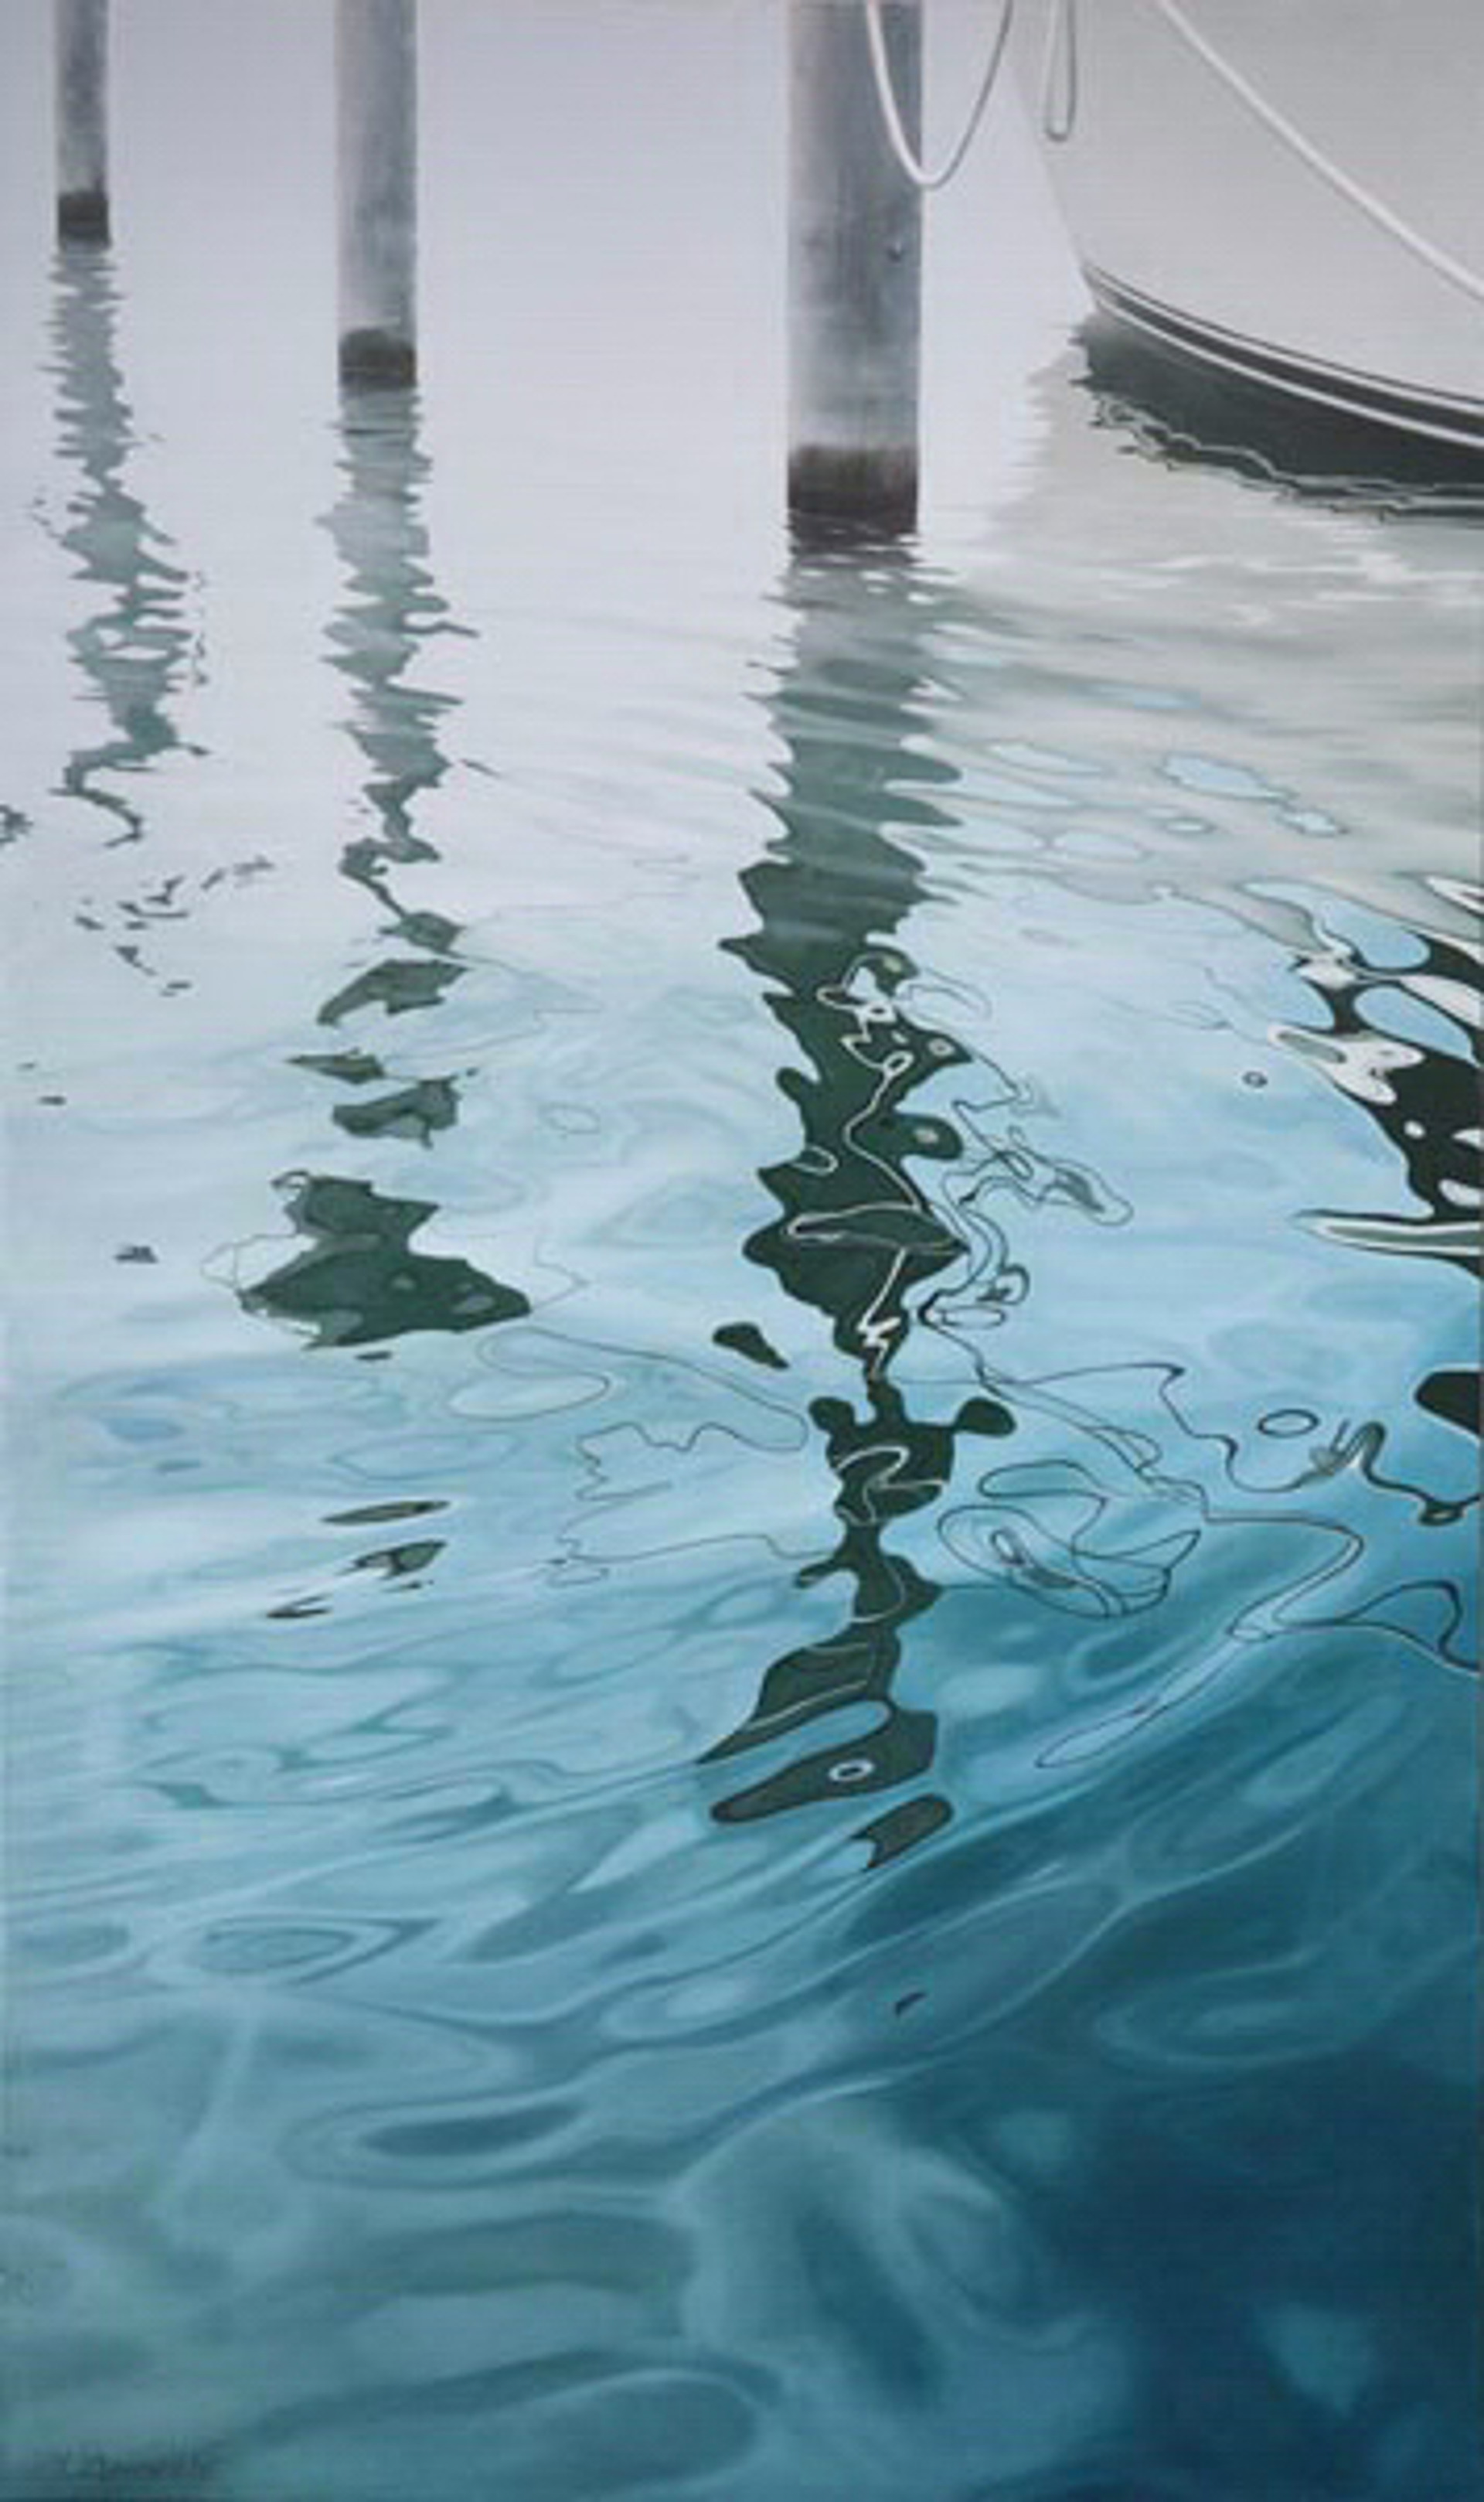 Harbor Reflection by Tatyana Klevenskiy